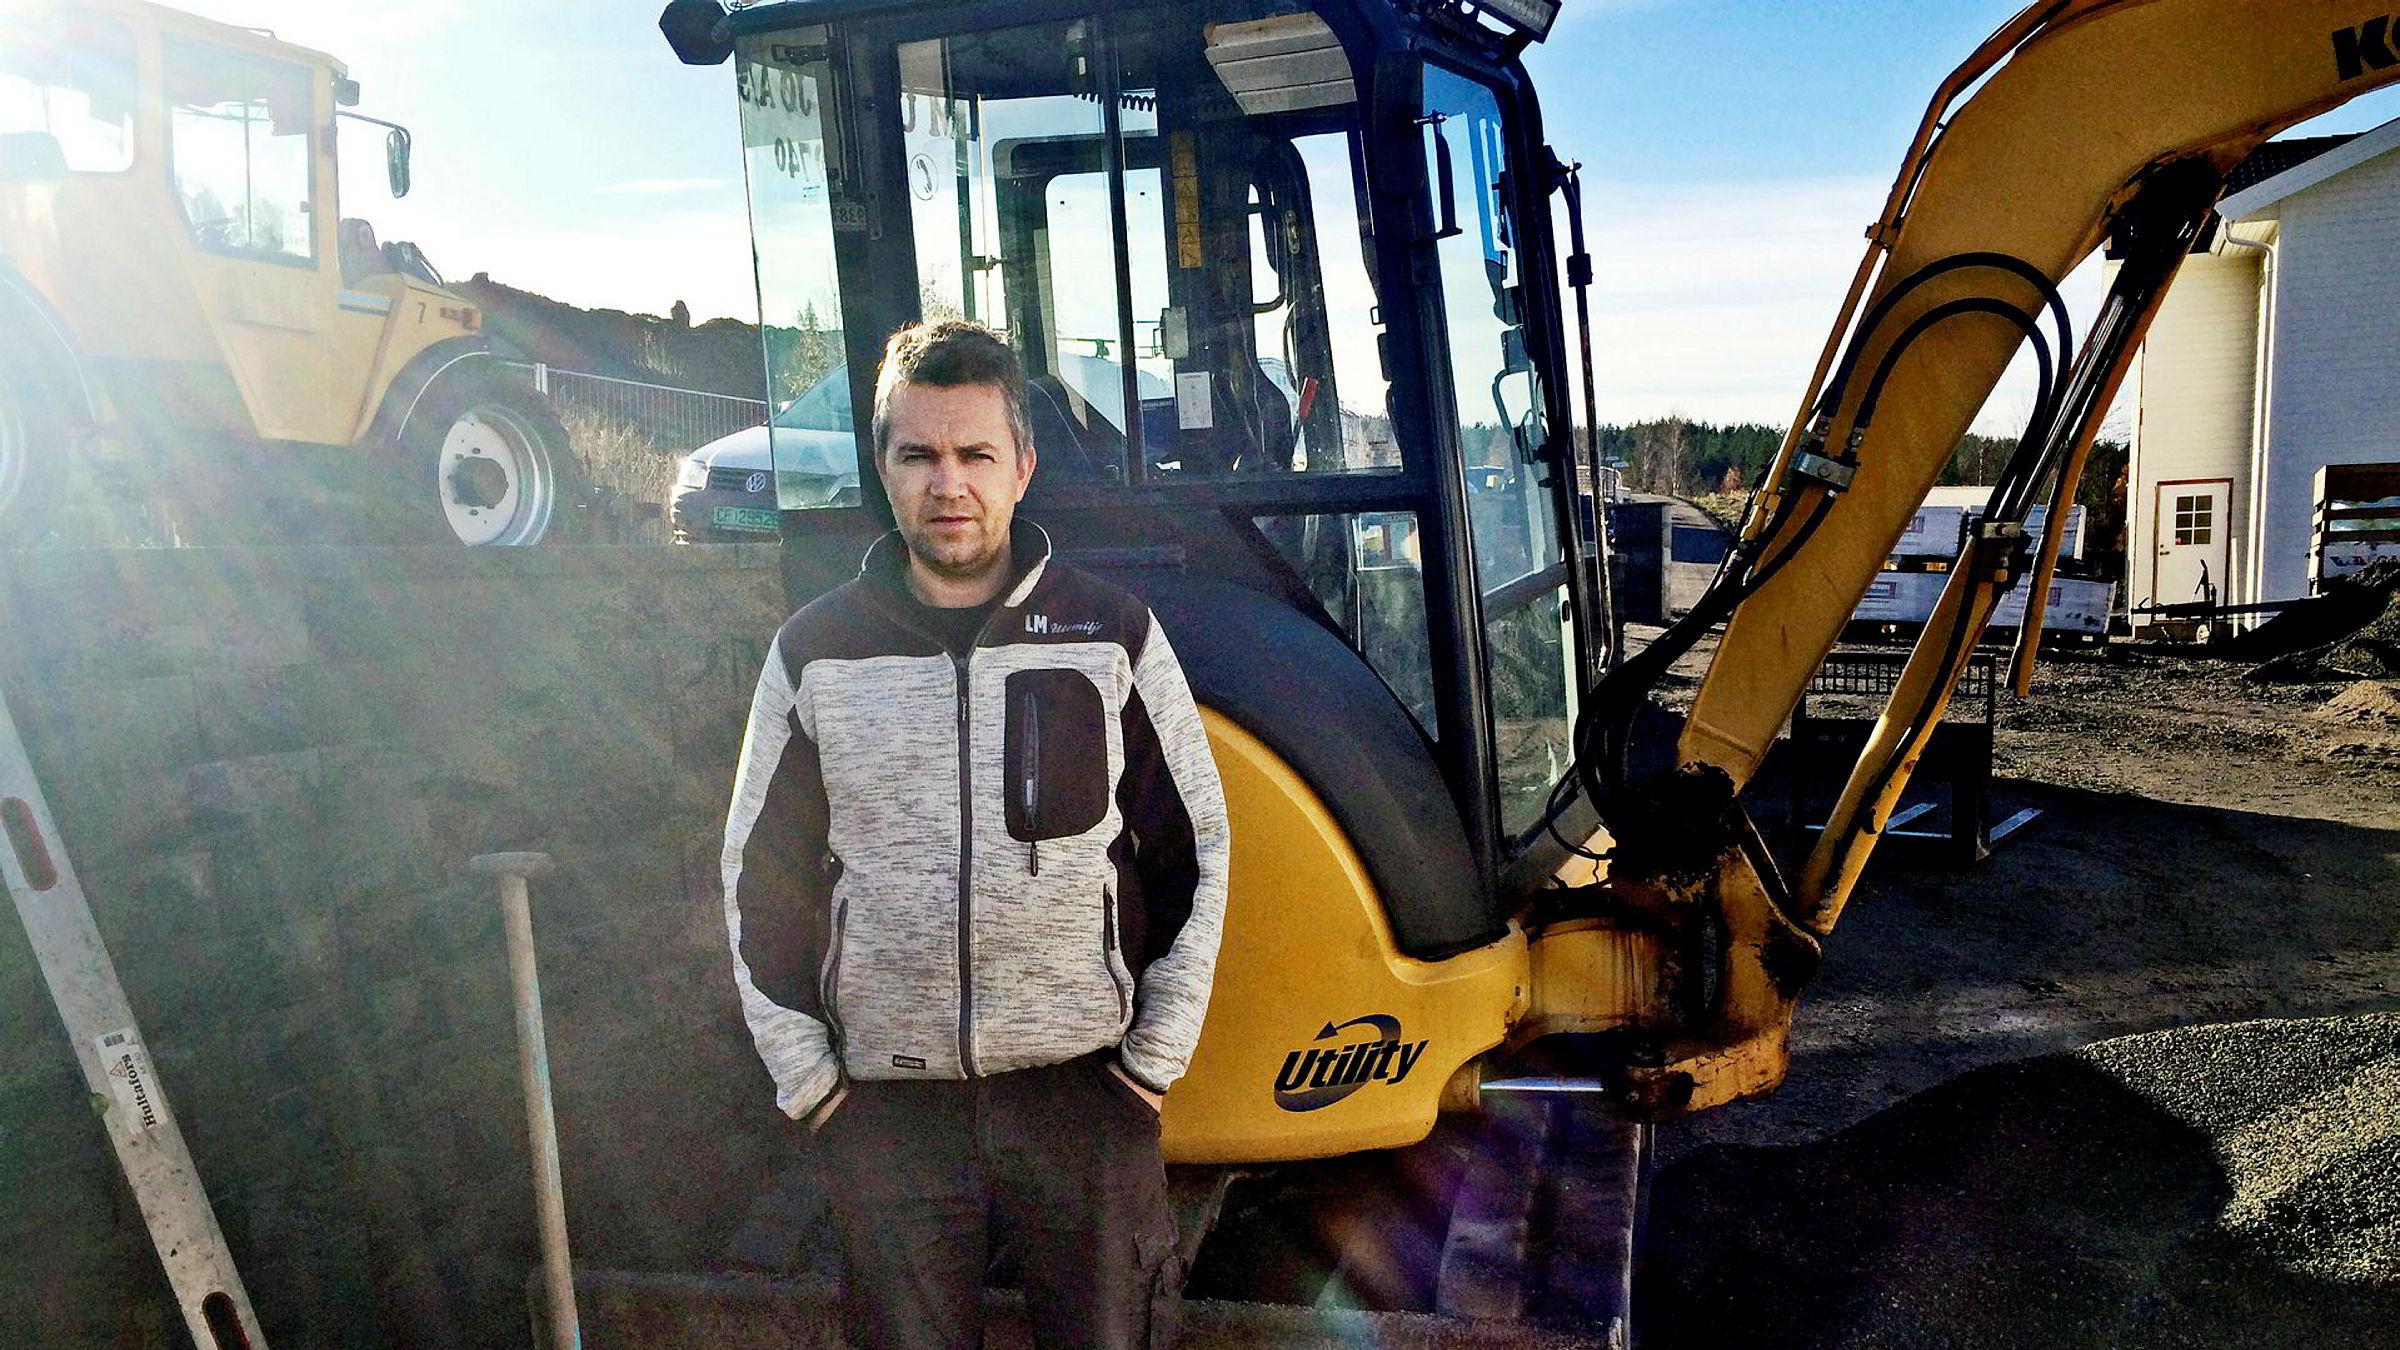 LM Utemiljø og styrelder Inge Malnes omsatte for 7,3 millioner kroner i fjor.